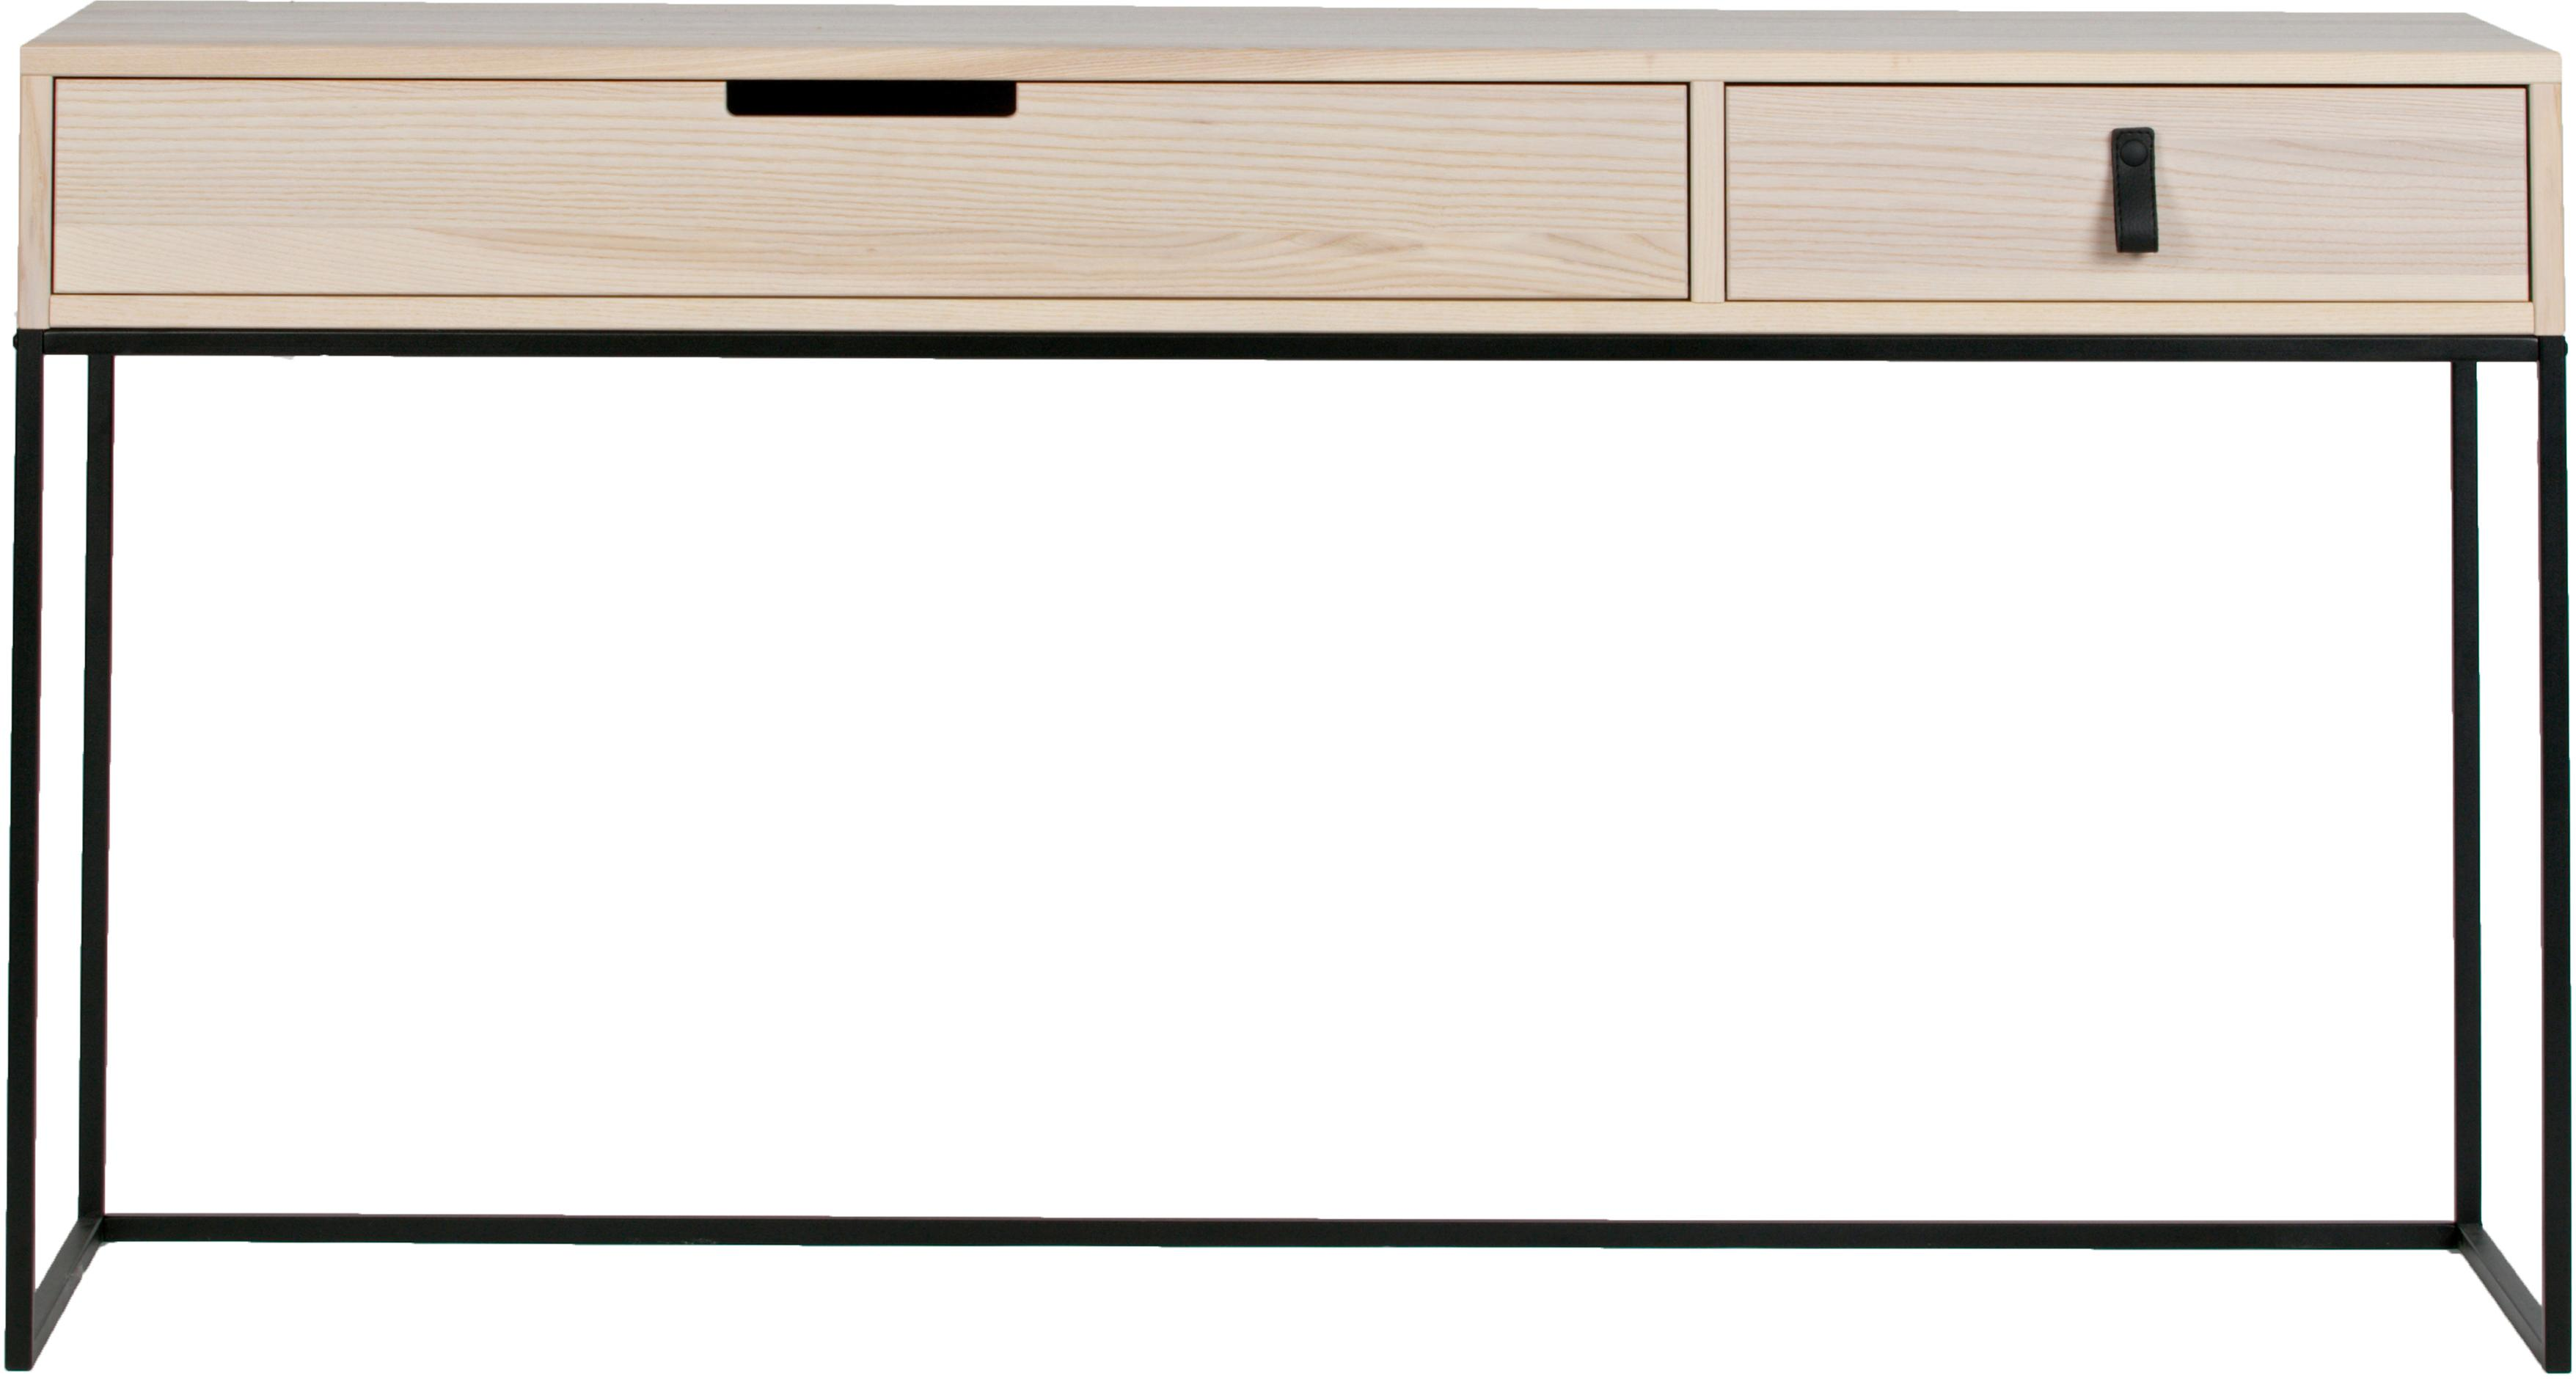 Konsole Silas mit 2 Schubladen, Korpus: Eschenholz, gebürstet, Gestell: Metall, lackiert, Eschenholz, Schwarz, B 140 x T 40 cm